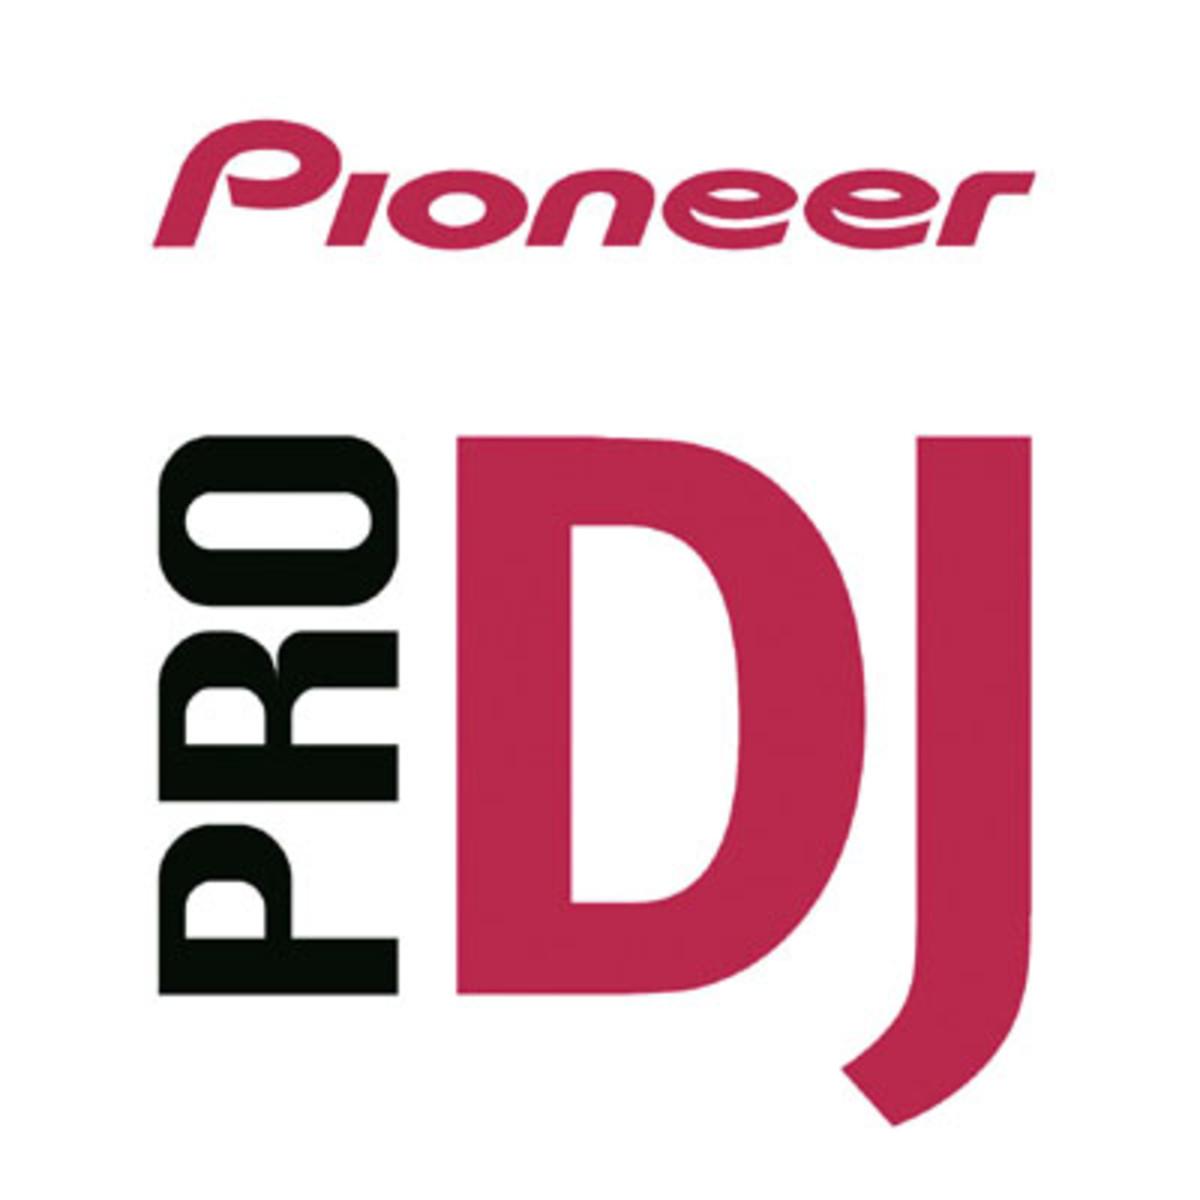 LOGO_PIONEER_DJ_JPG.jpg